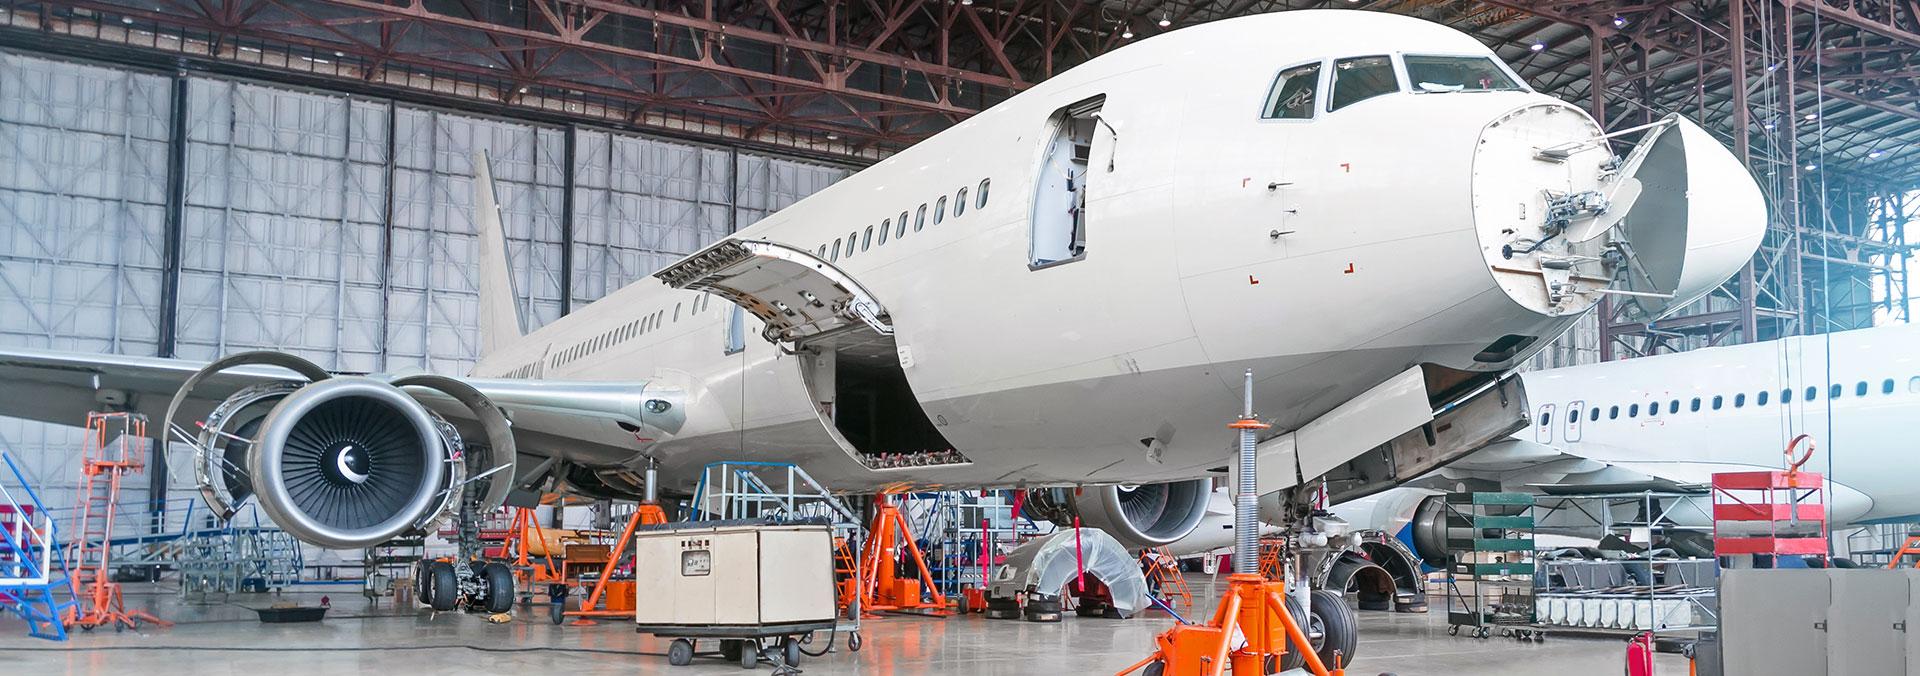 Uçak Mühendisliği (Yükseklisans) (Tezli)